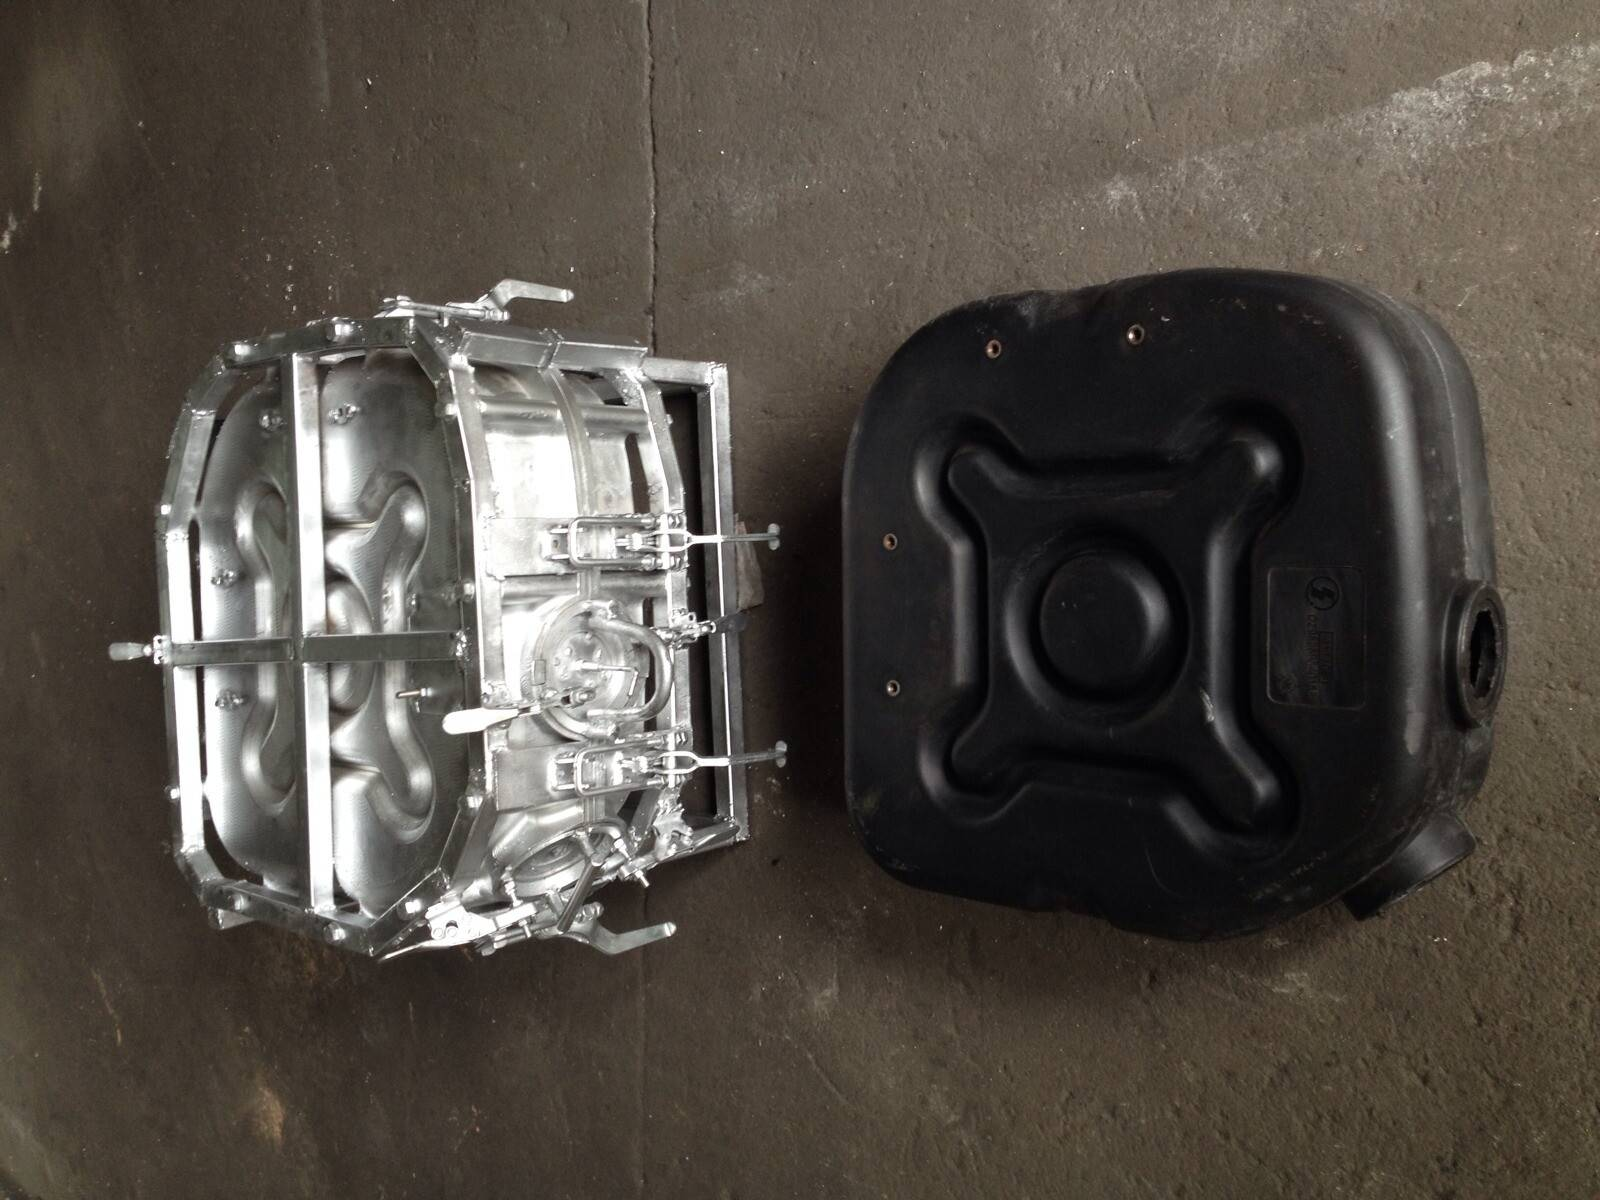 Rotational Molds for Fuel Tank, Urea Tank, Rotomolding Box Mold, Rotational Molding Moulds